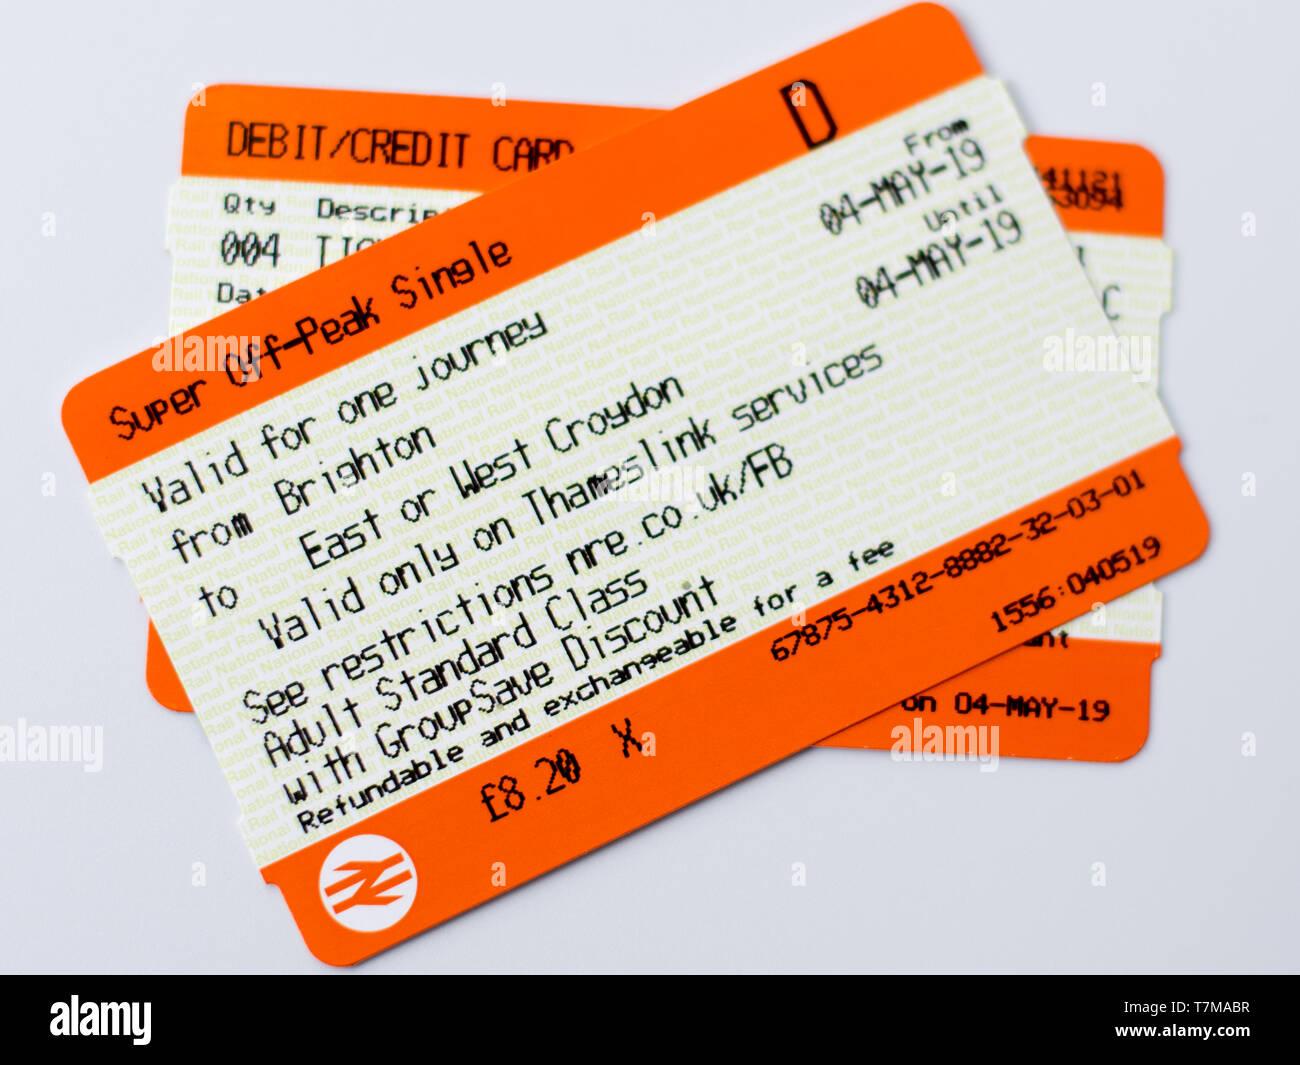 National rail ticket - Stock Image